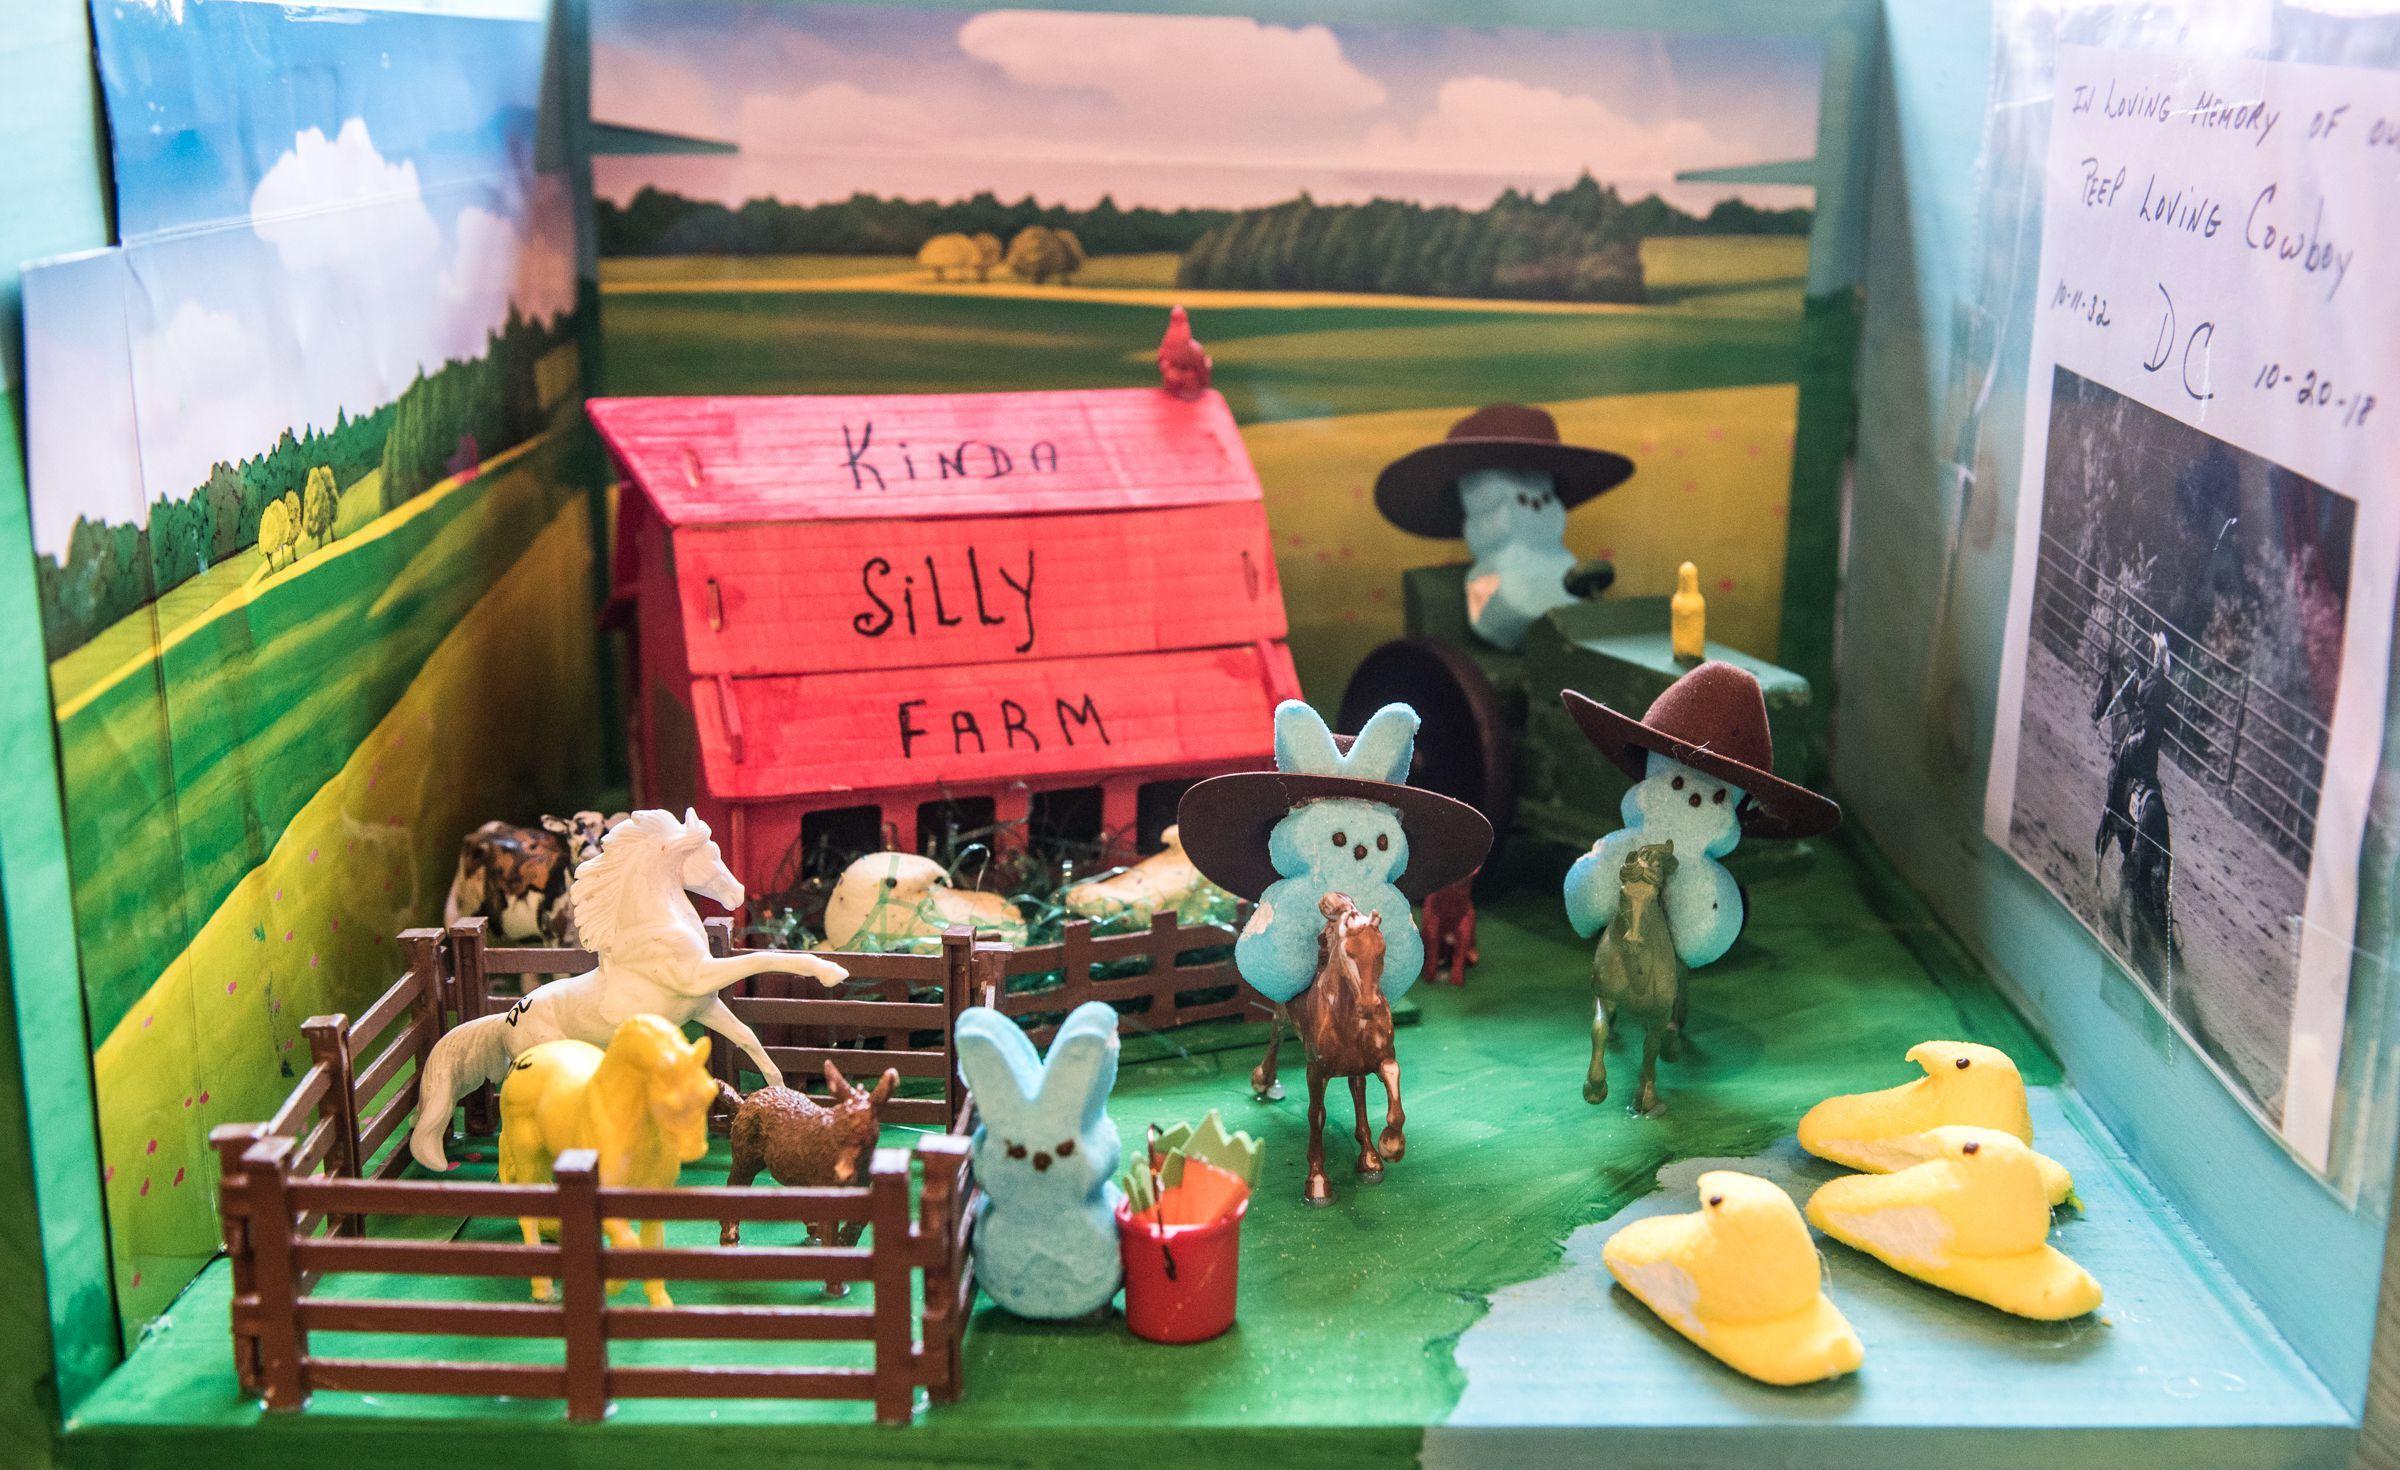 A Peeps diorama contest takes over Peddler's Village — no